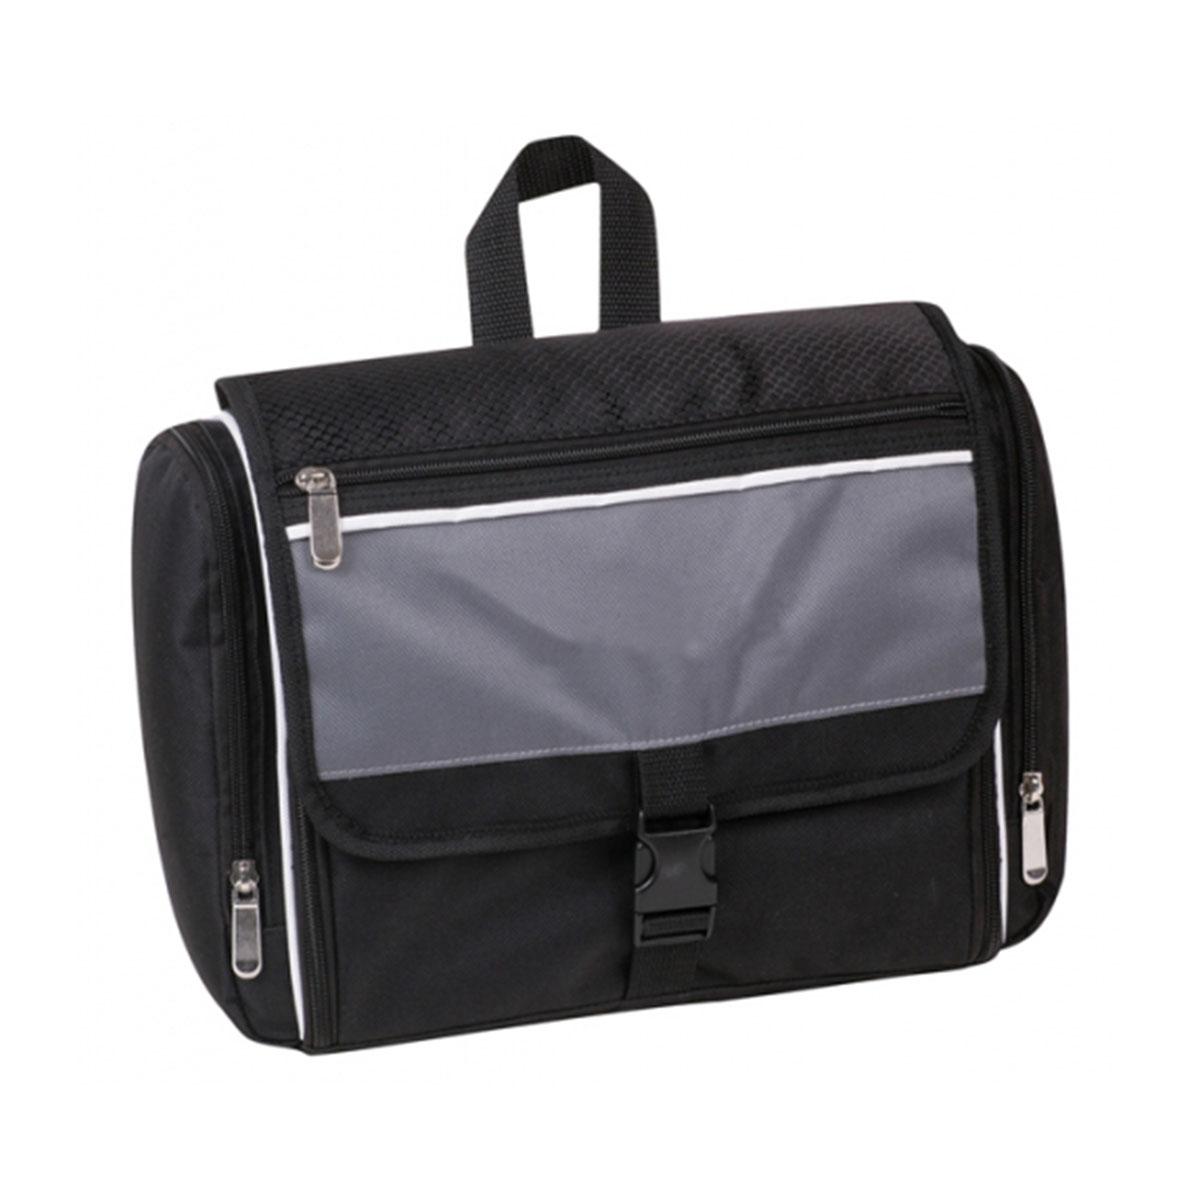 Toiletry Bag-Black / White / Charcoal